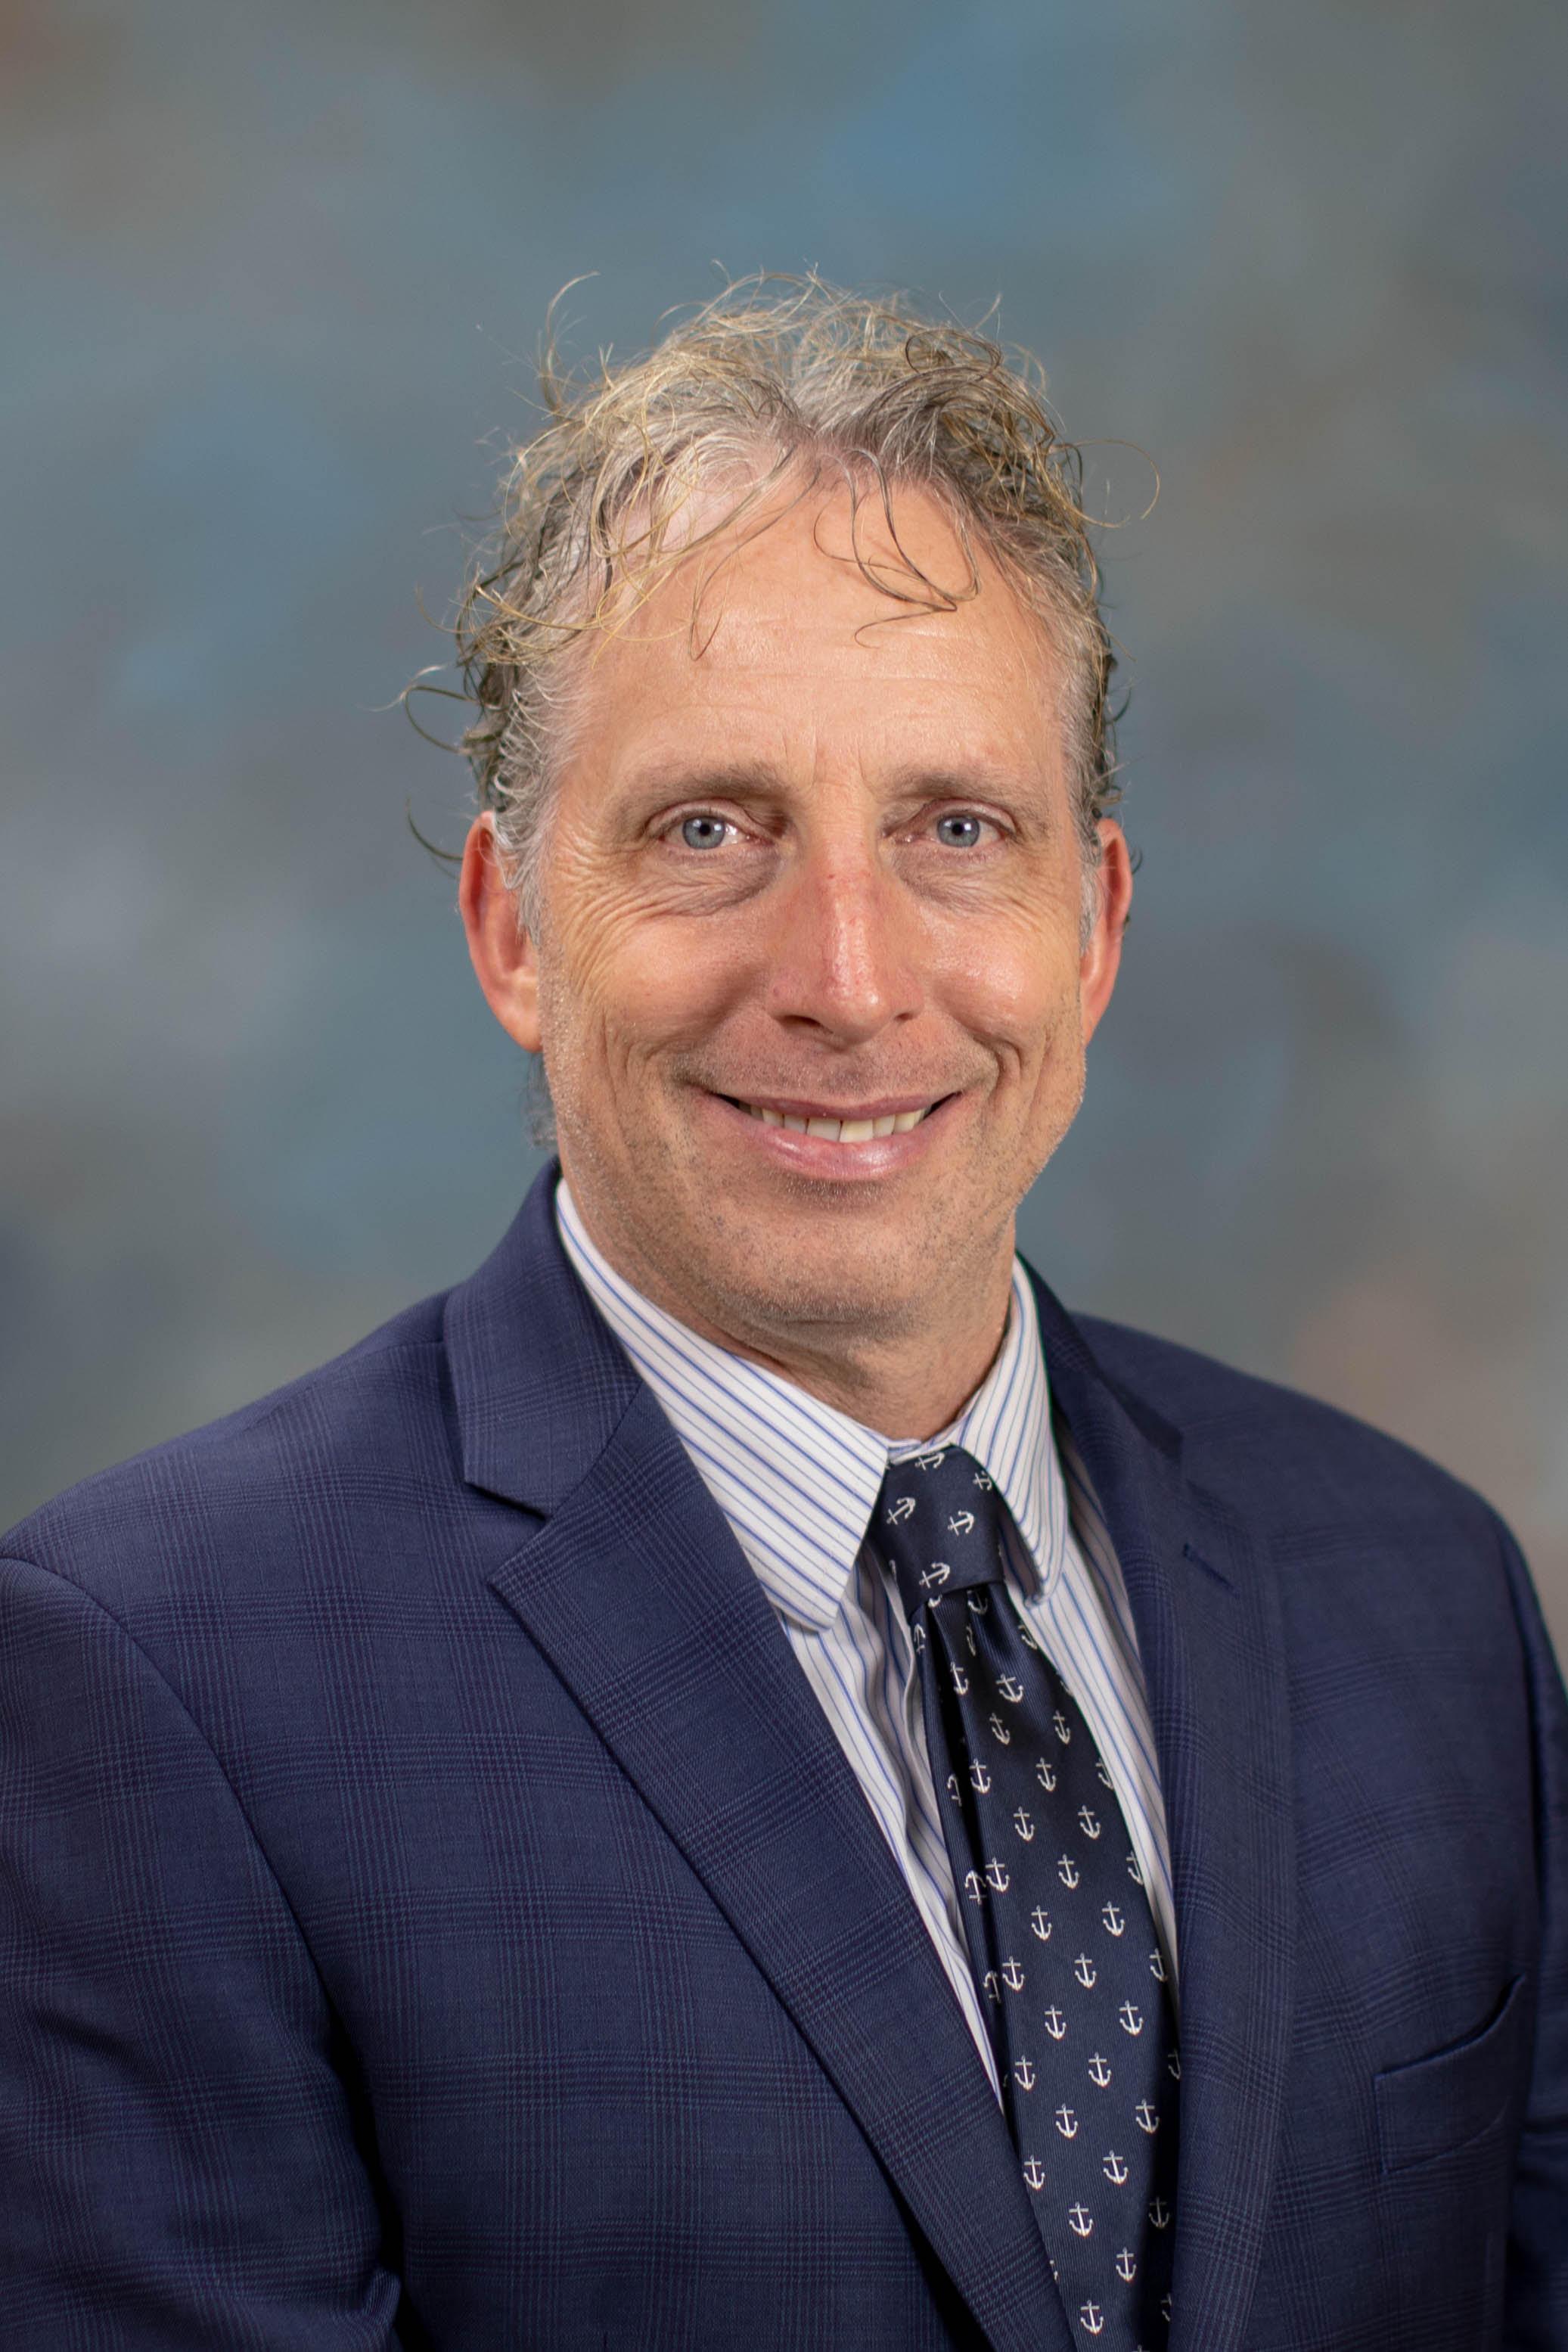 Dr. John Farrelly - Dare County Schools Superintendent, Ex-Officio Member